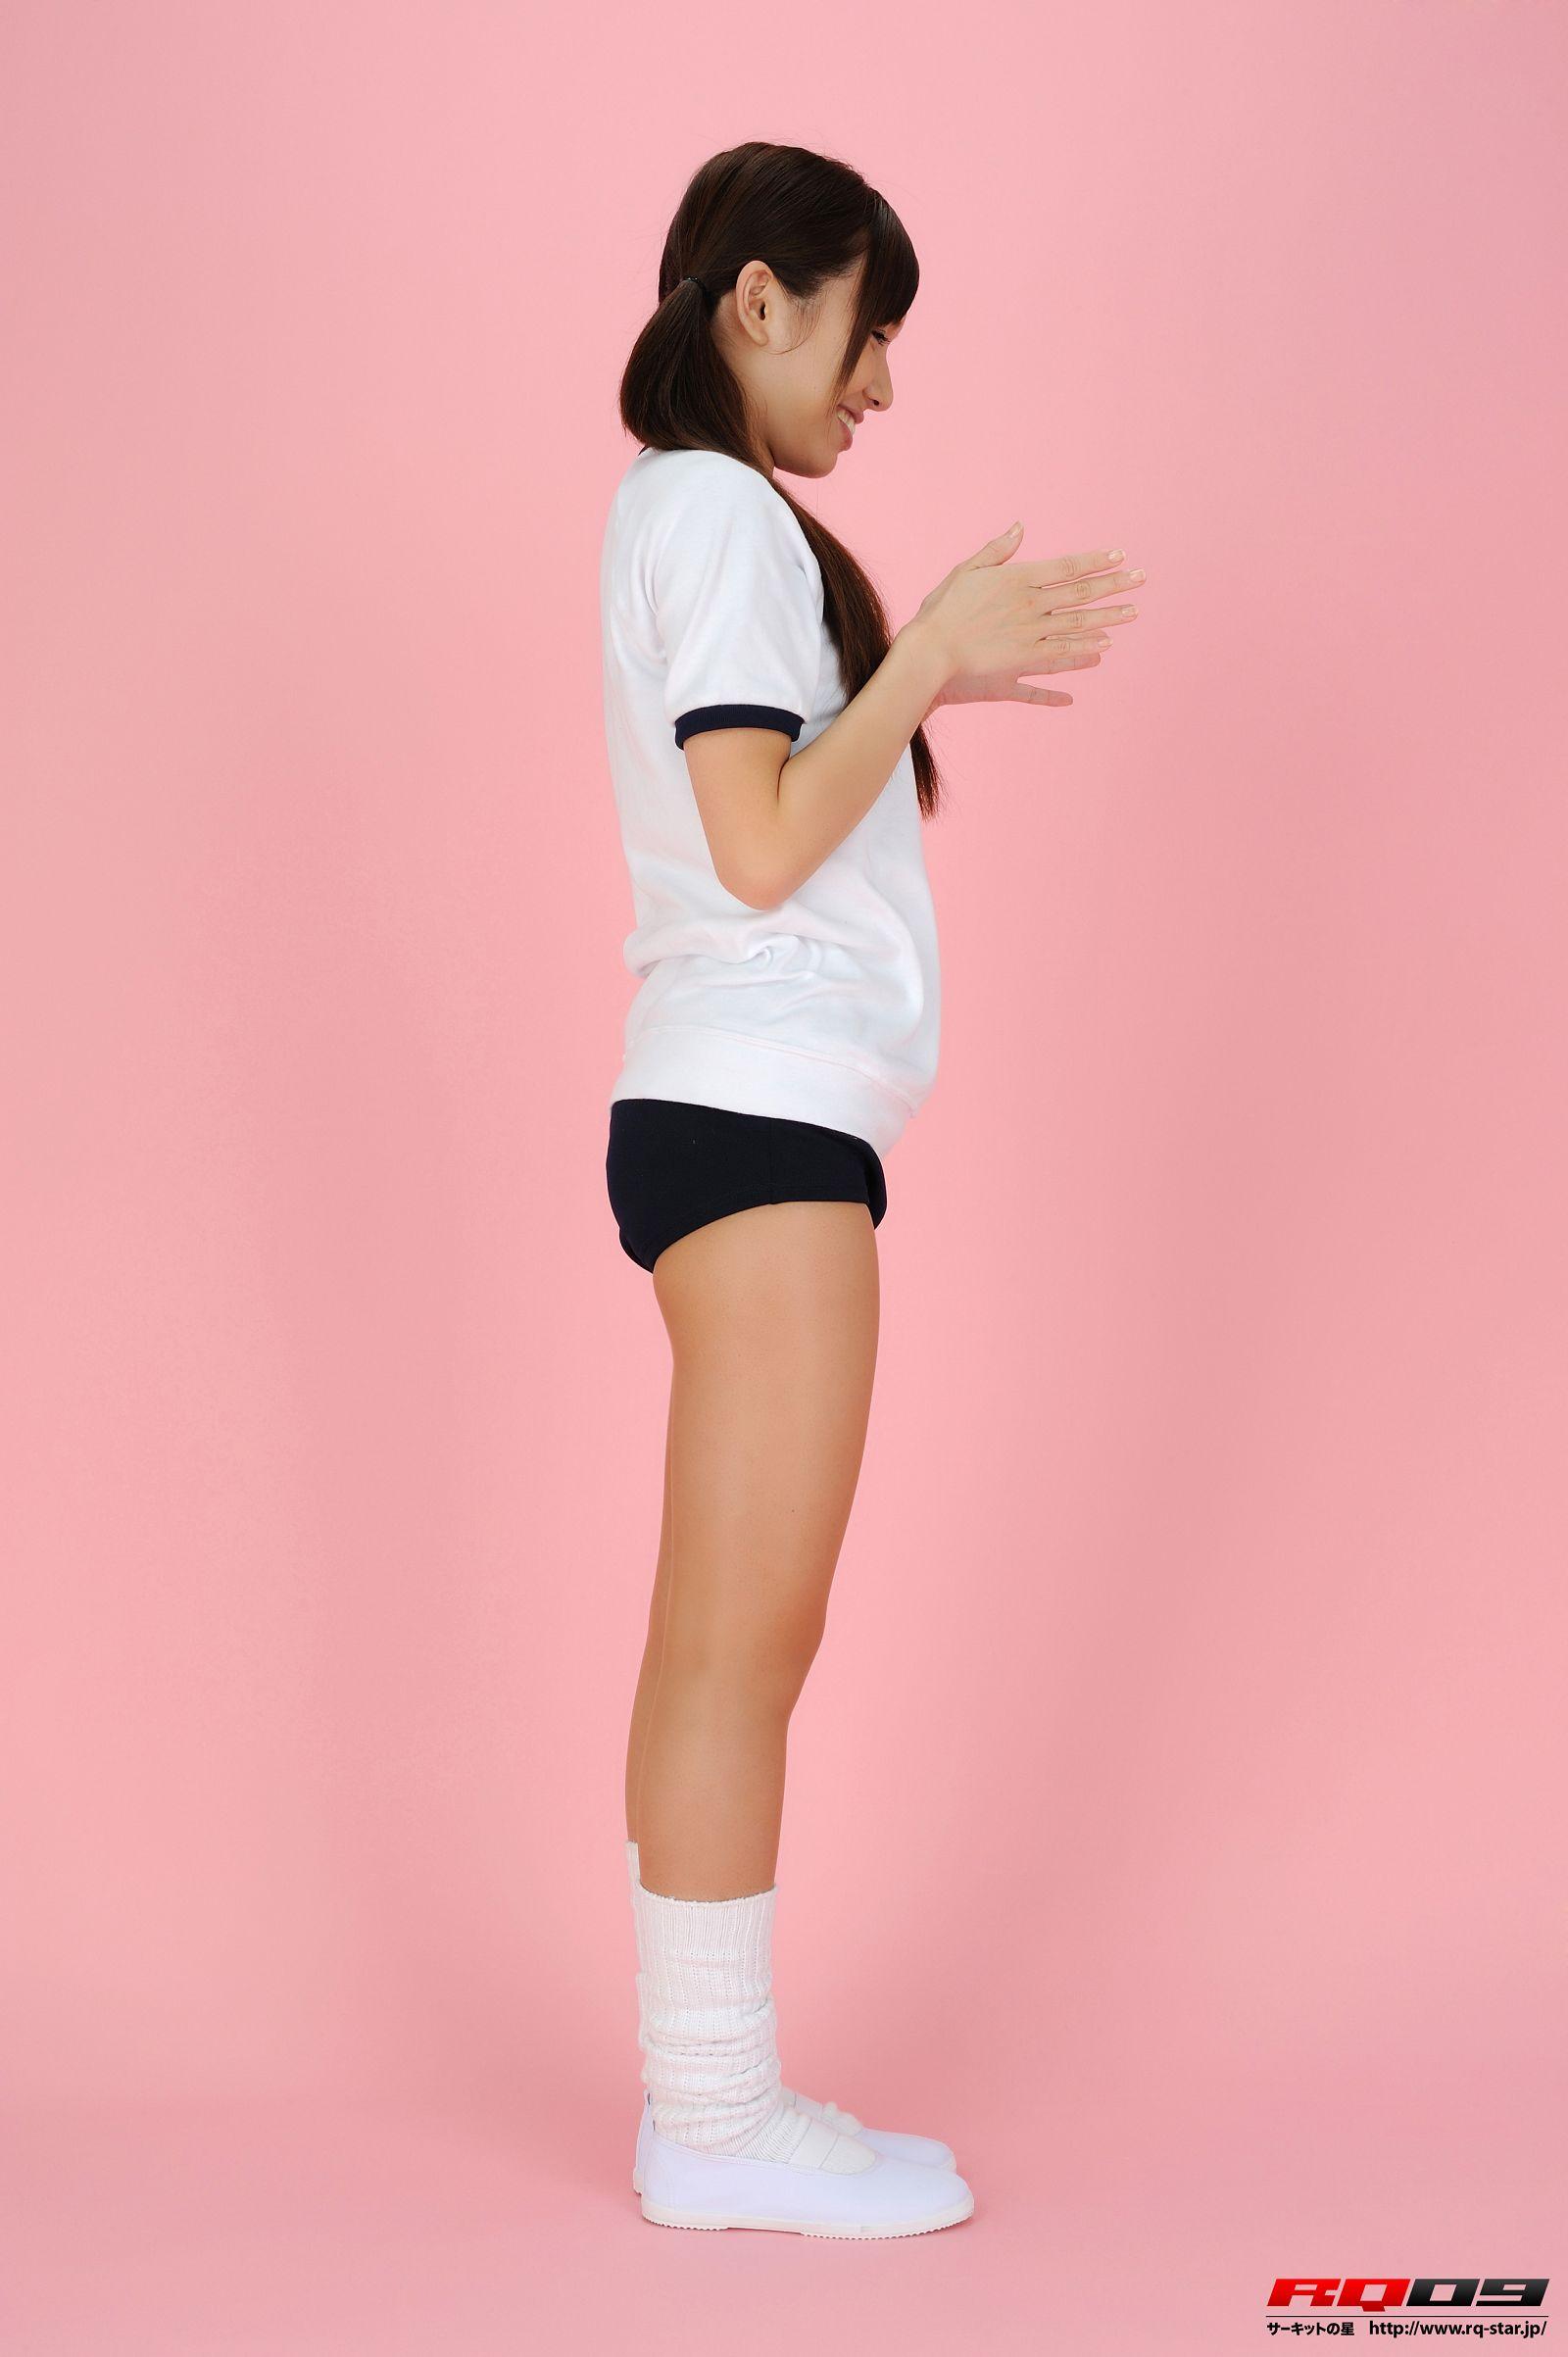 [RQ STAR美女] NO.0227 Asami Nakata 中田あさみ Bloomers Gymwear[70P] RQ STAR 第4张